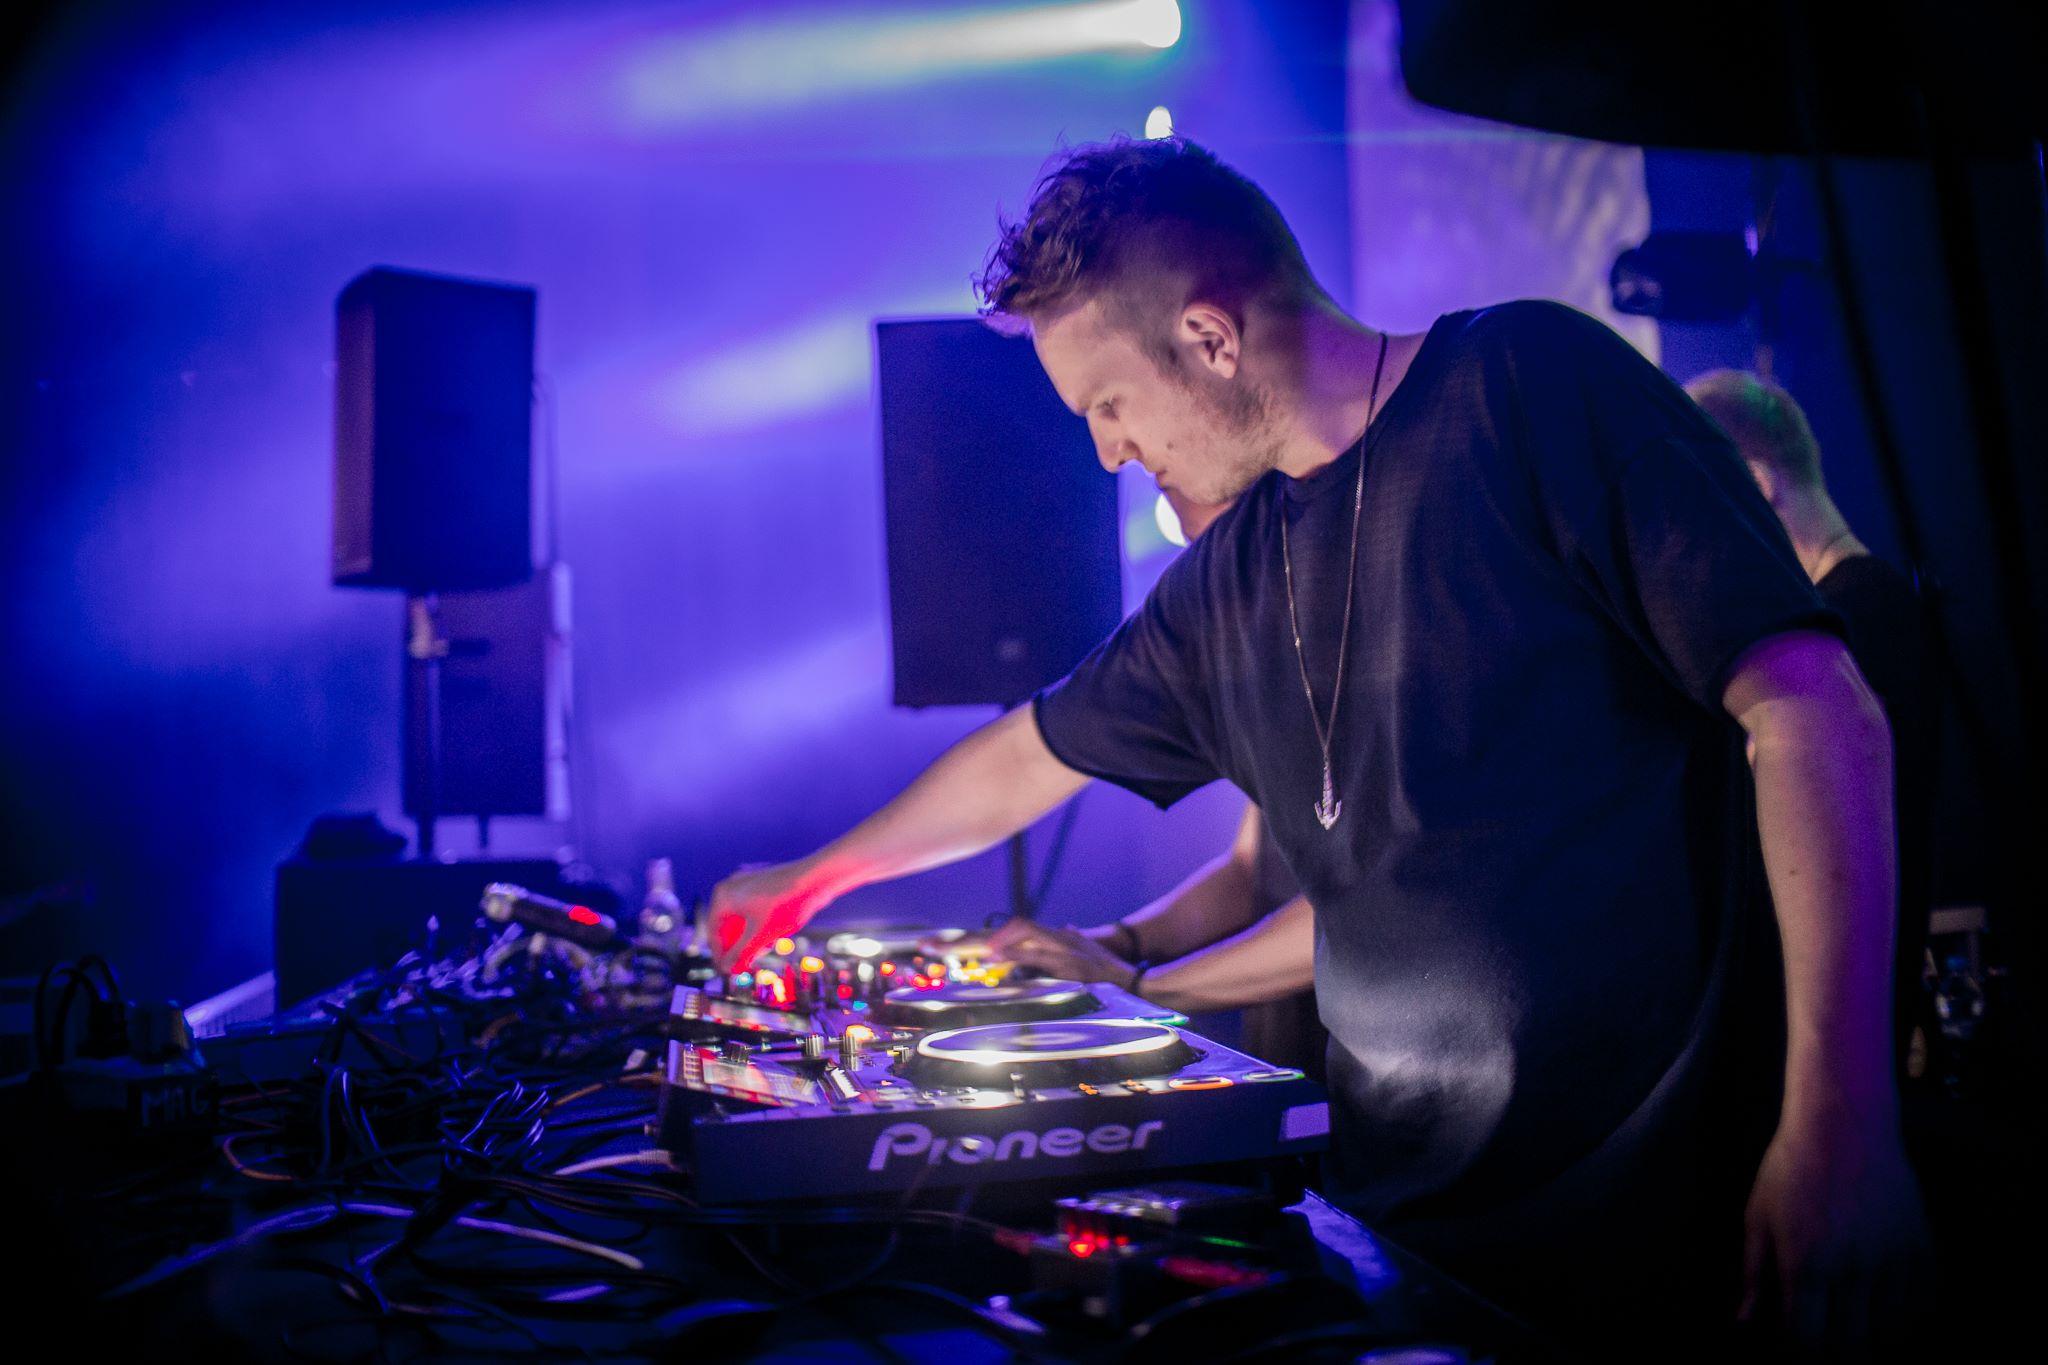 Kevin De Vries invites Weska • 26 V '18